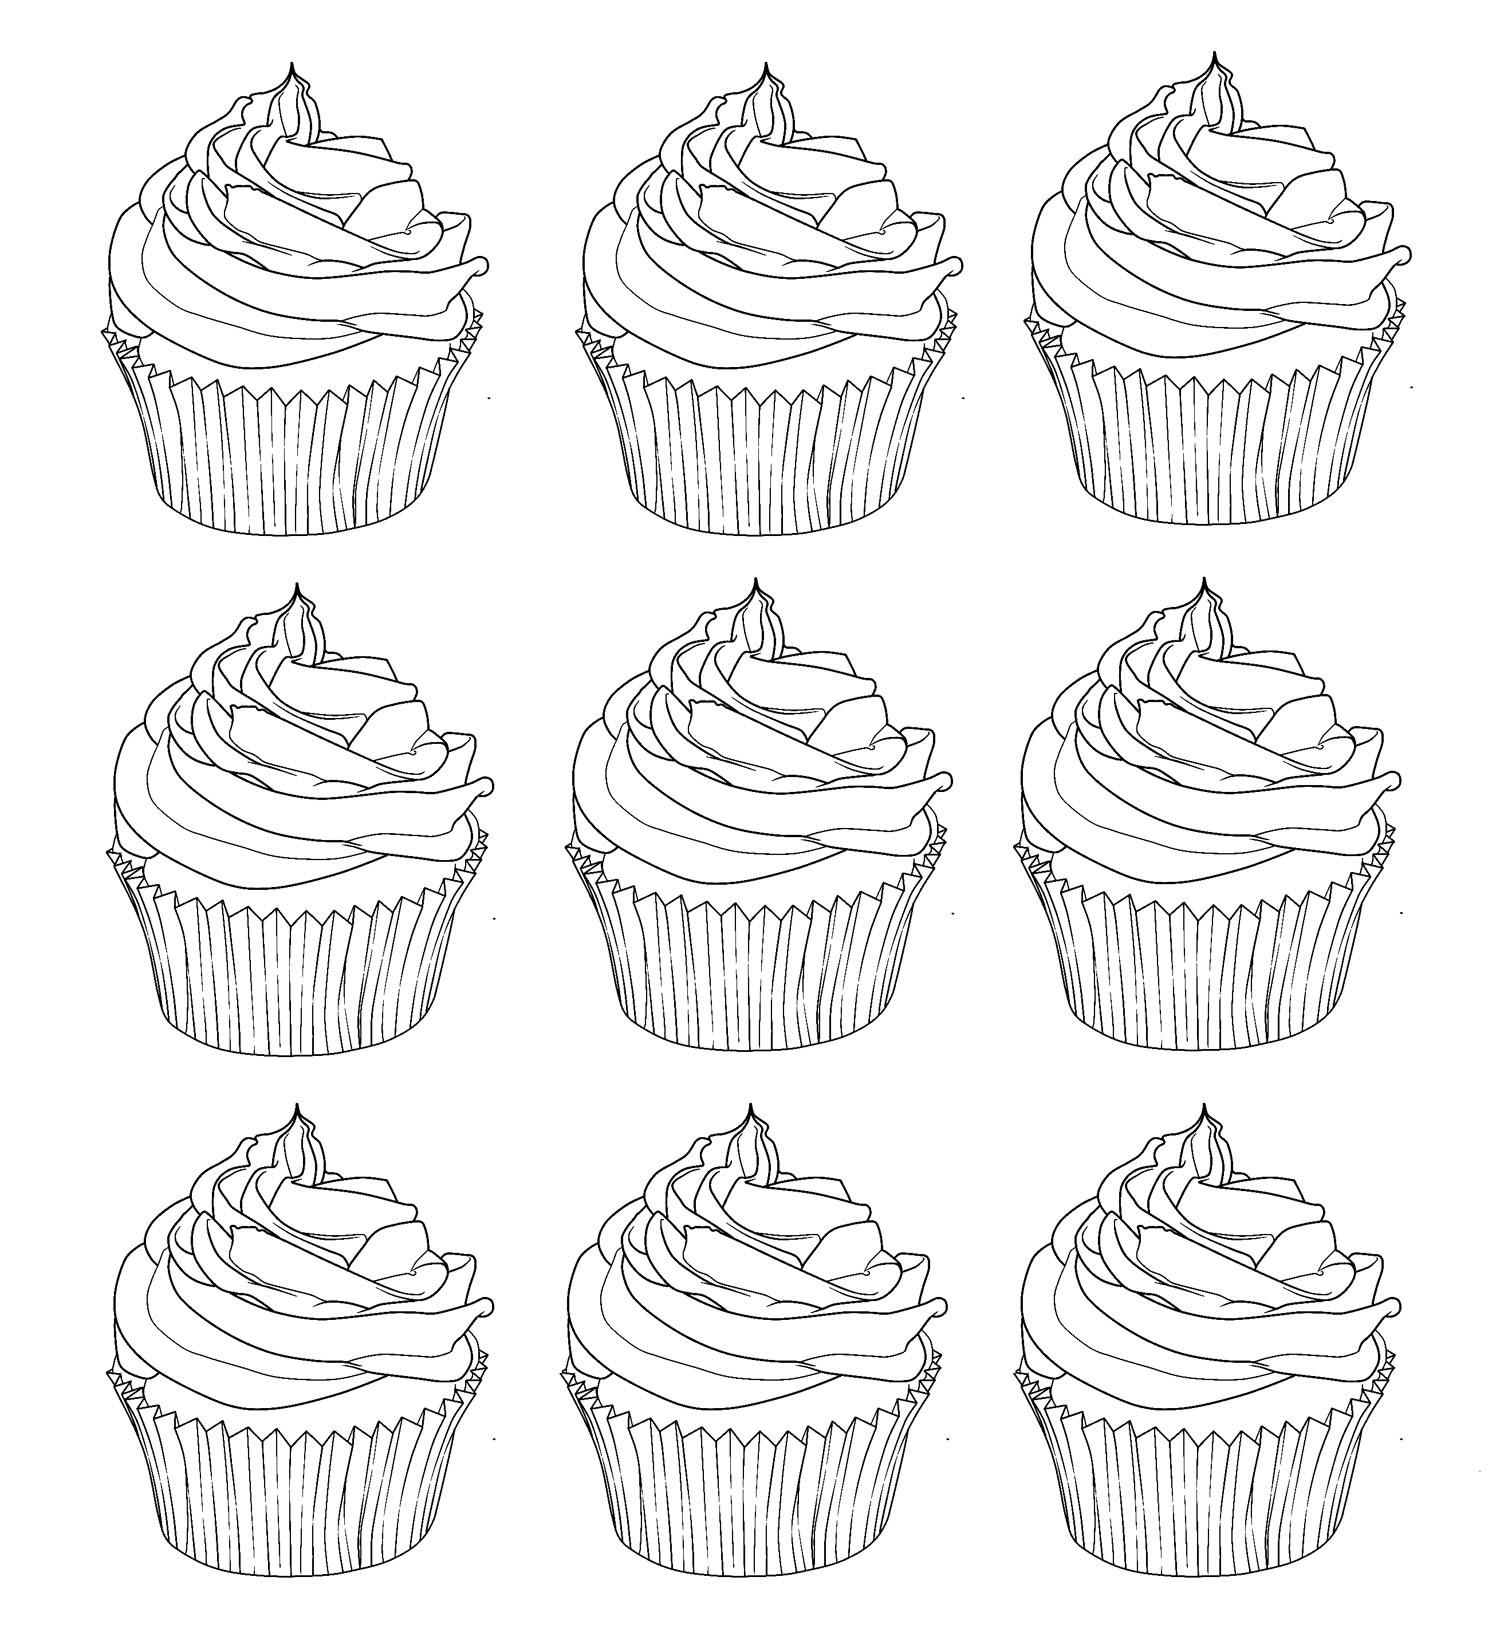 Cupcakes warhol Cupcakes Adult